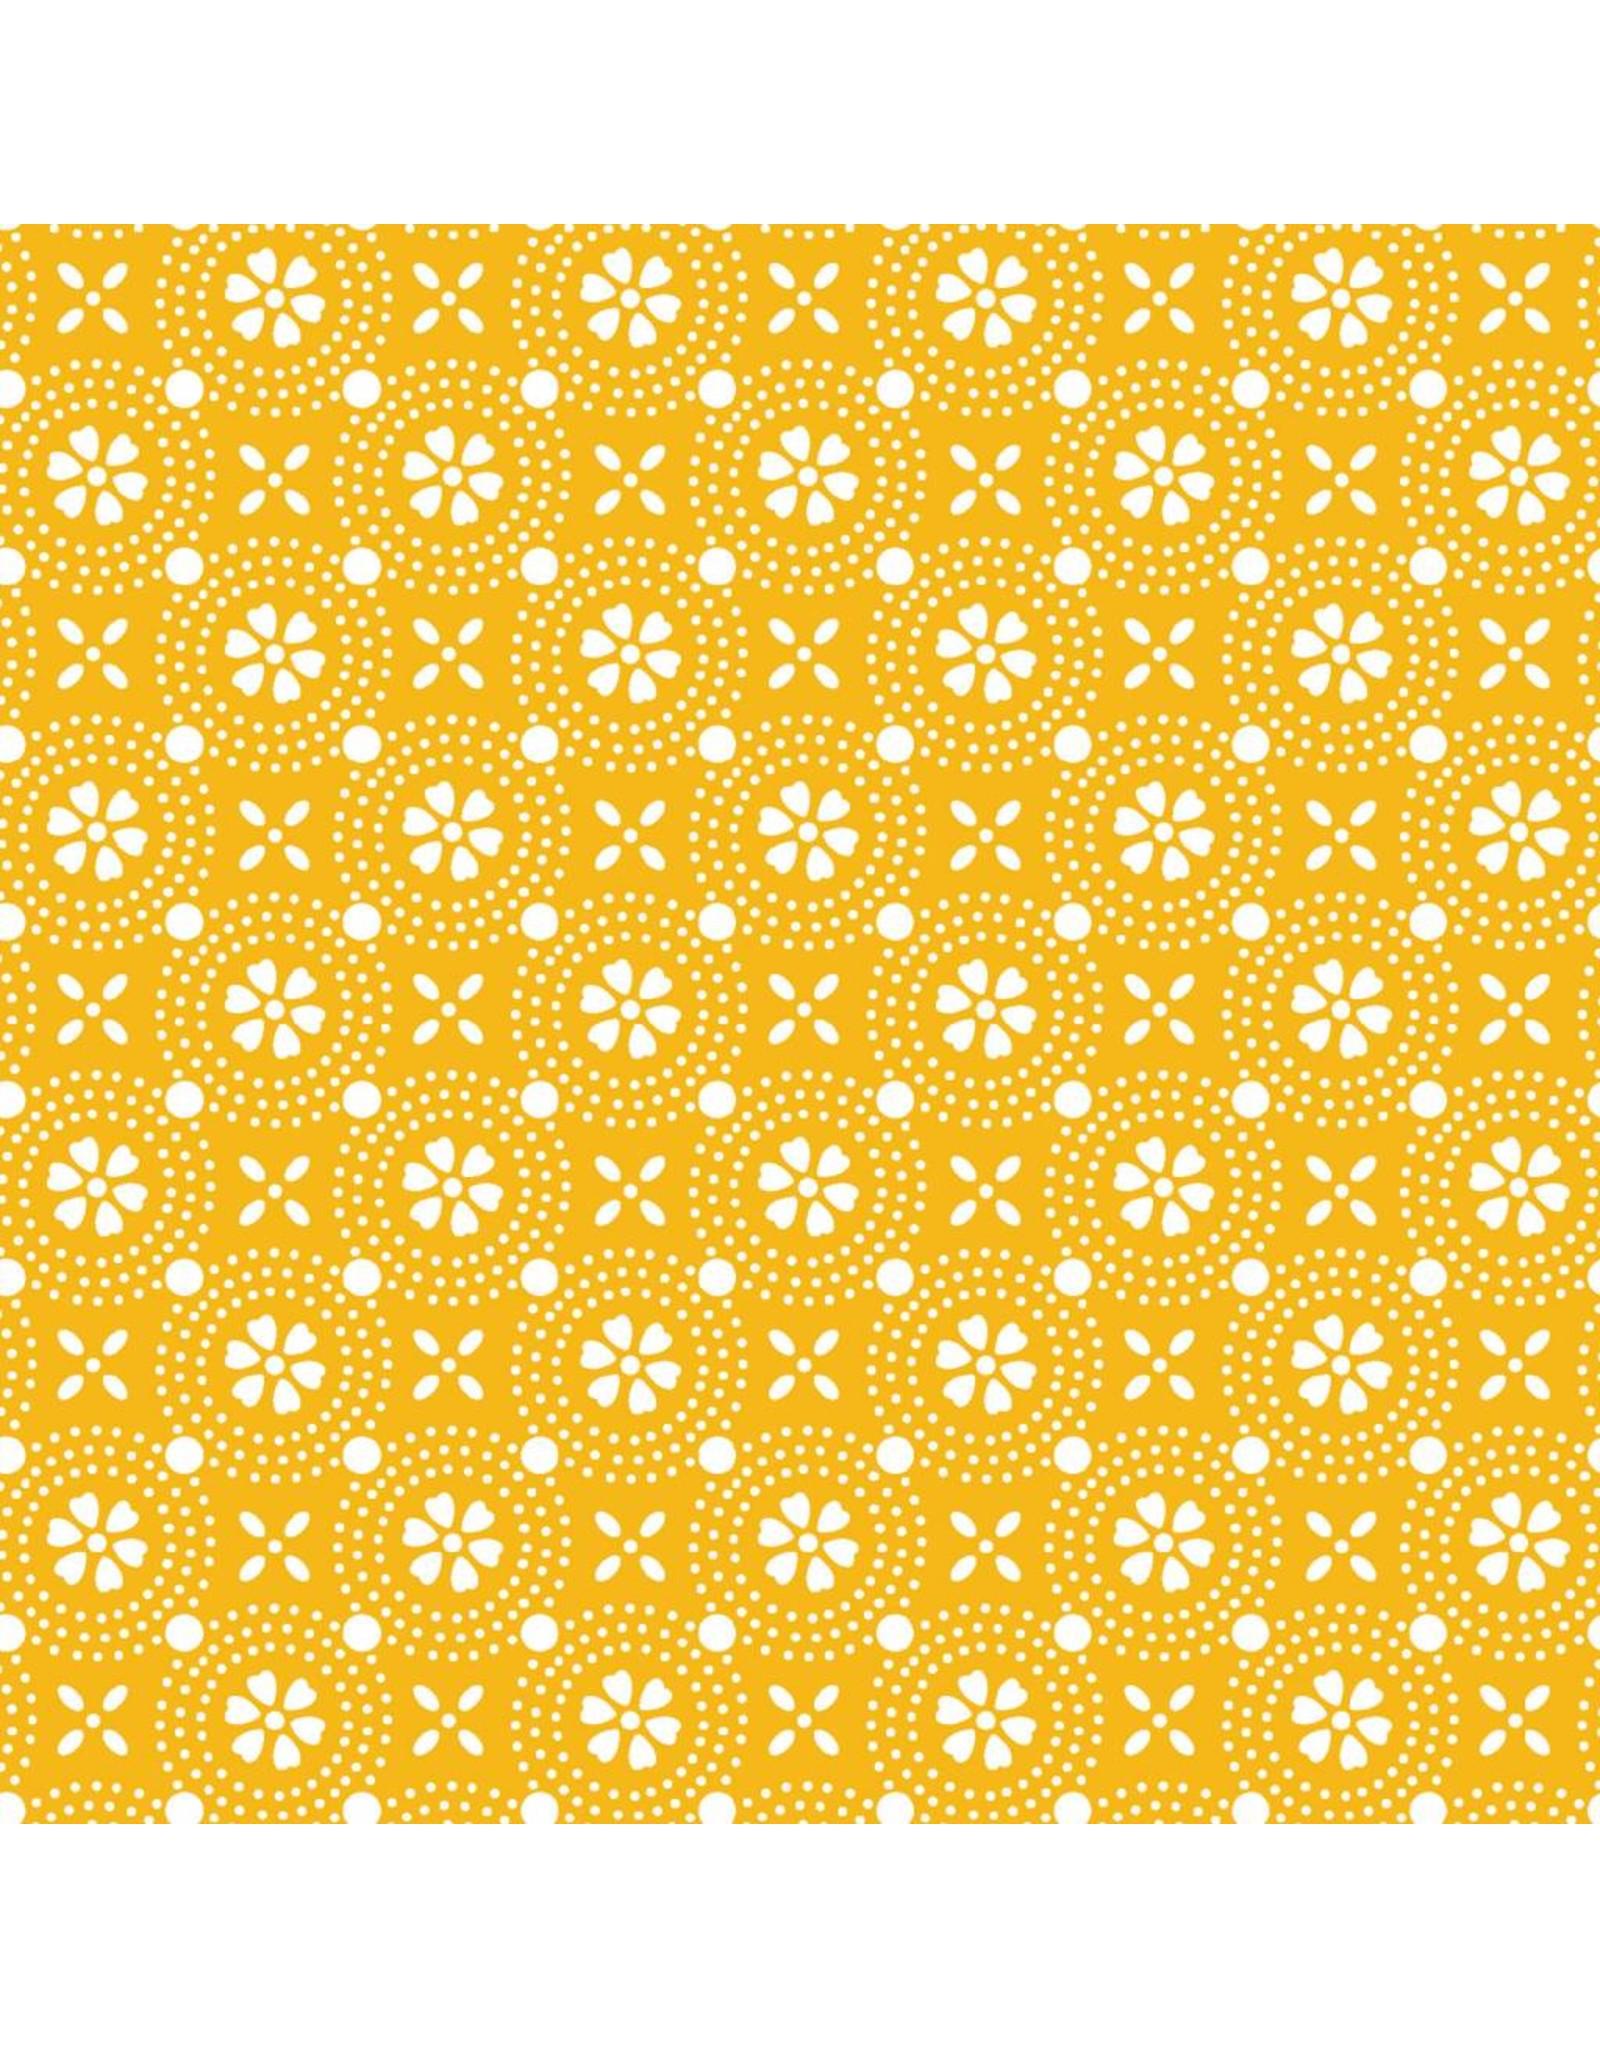 Maywood Studio Dotted Circles - Yellow